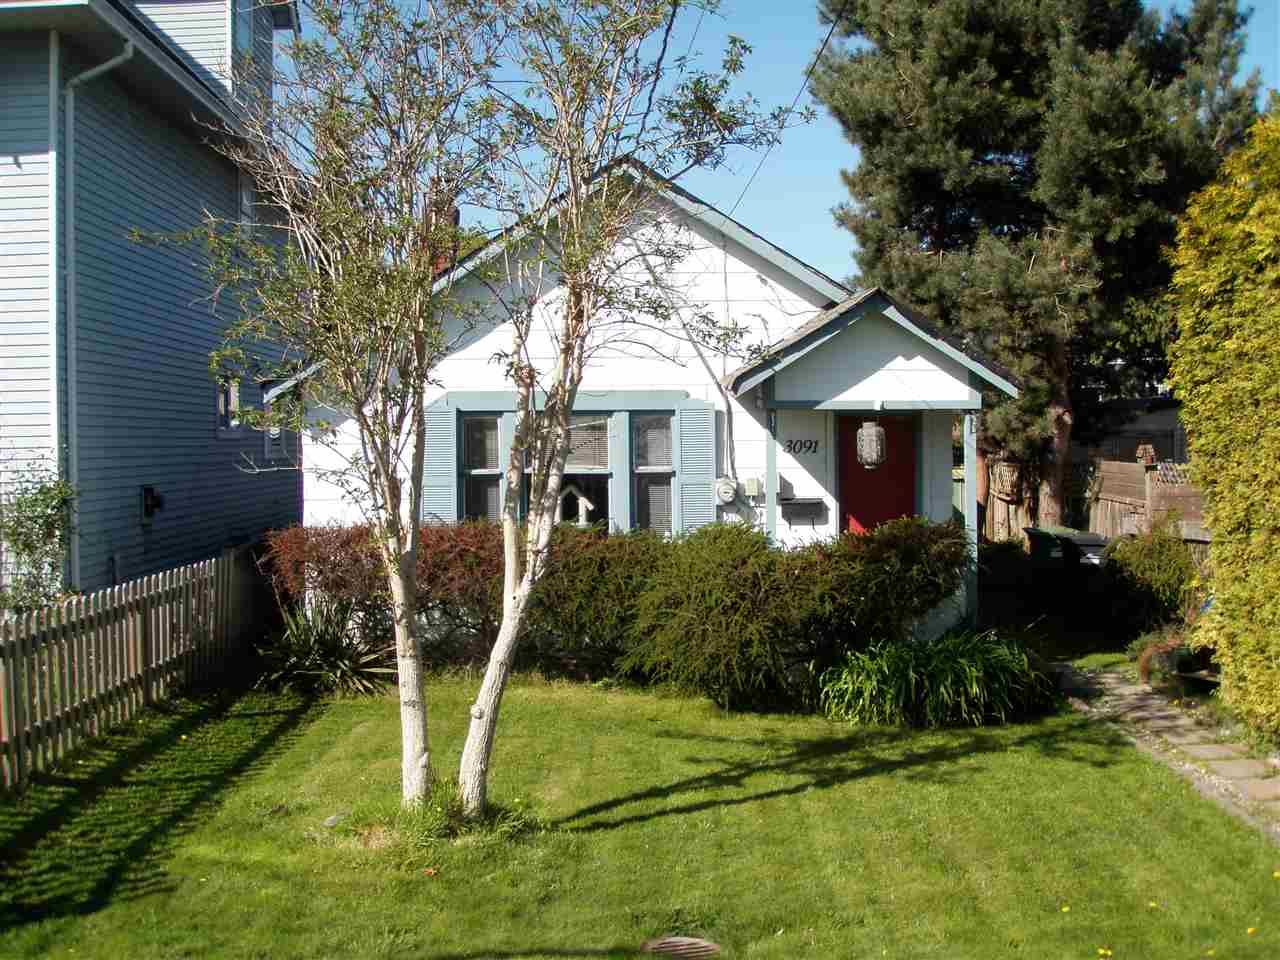 Photo 1: Photos: 3091 CHATHAM STREET in Richmond: Steveston Village House for sale : MLS®# R2140804